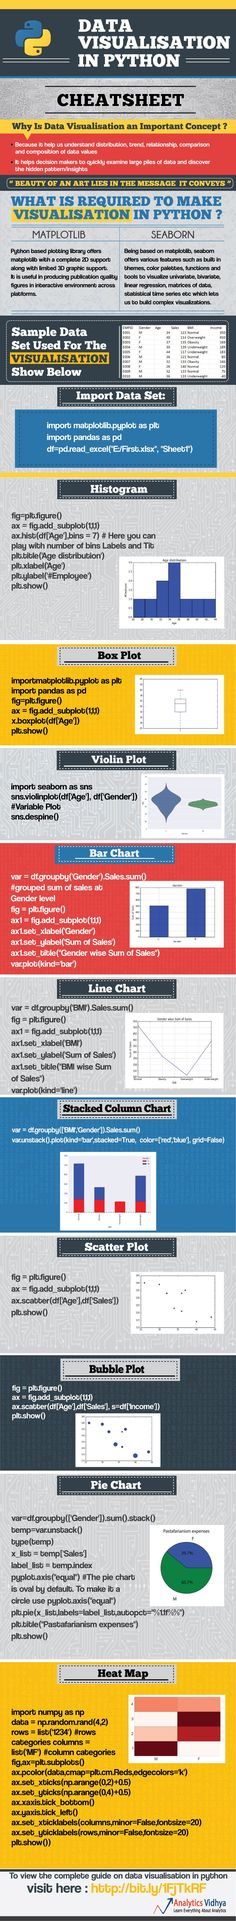 infographic, data science, data visualisation python